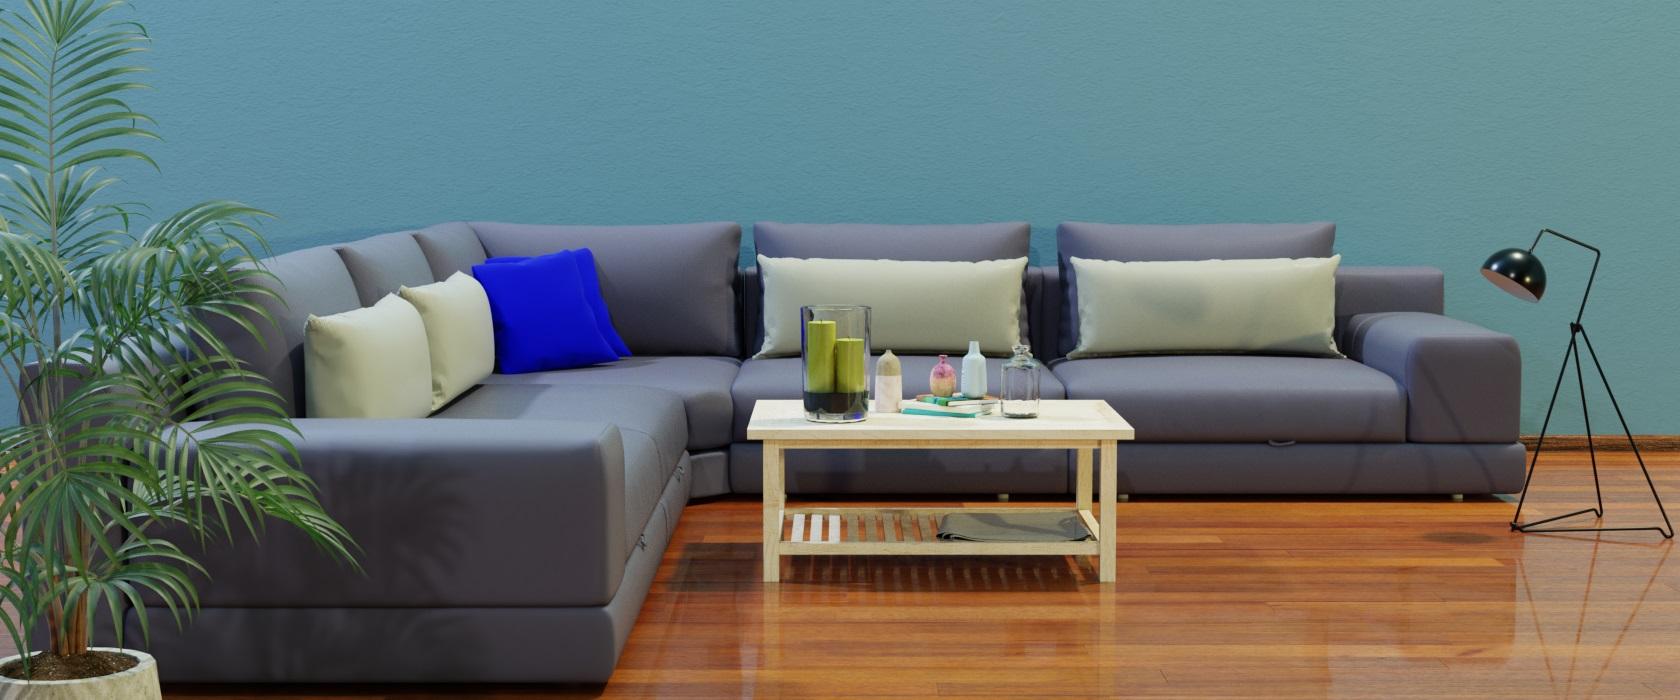 Модульный диван Dario 355x355 - Фото 2 - Pufetto